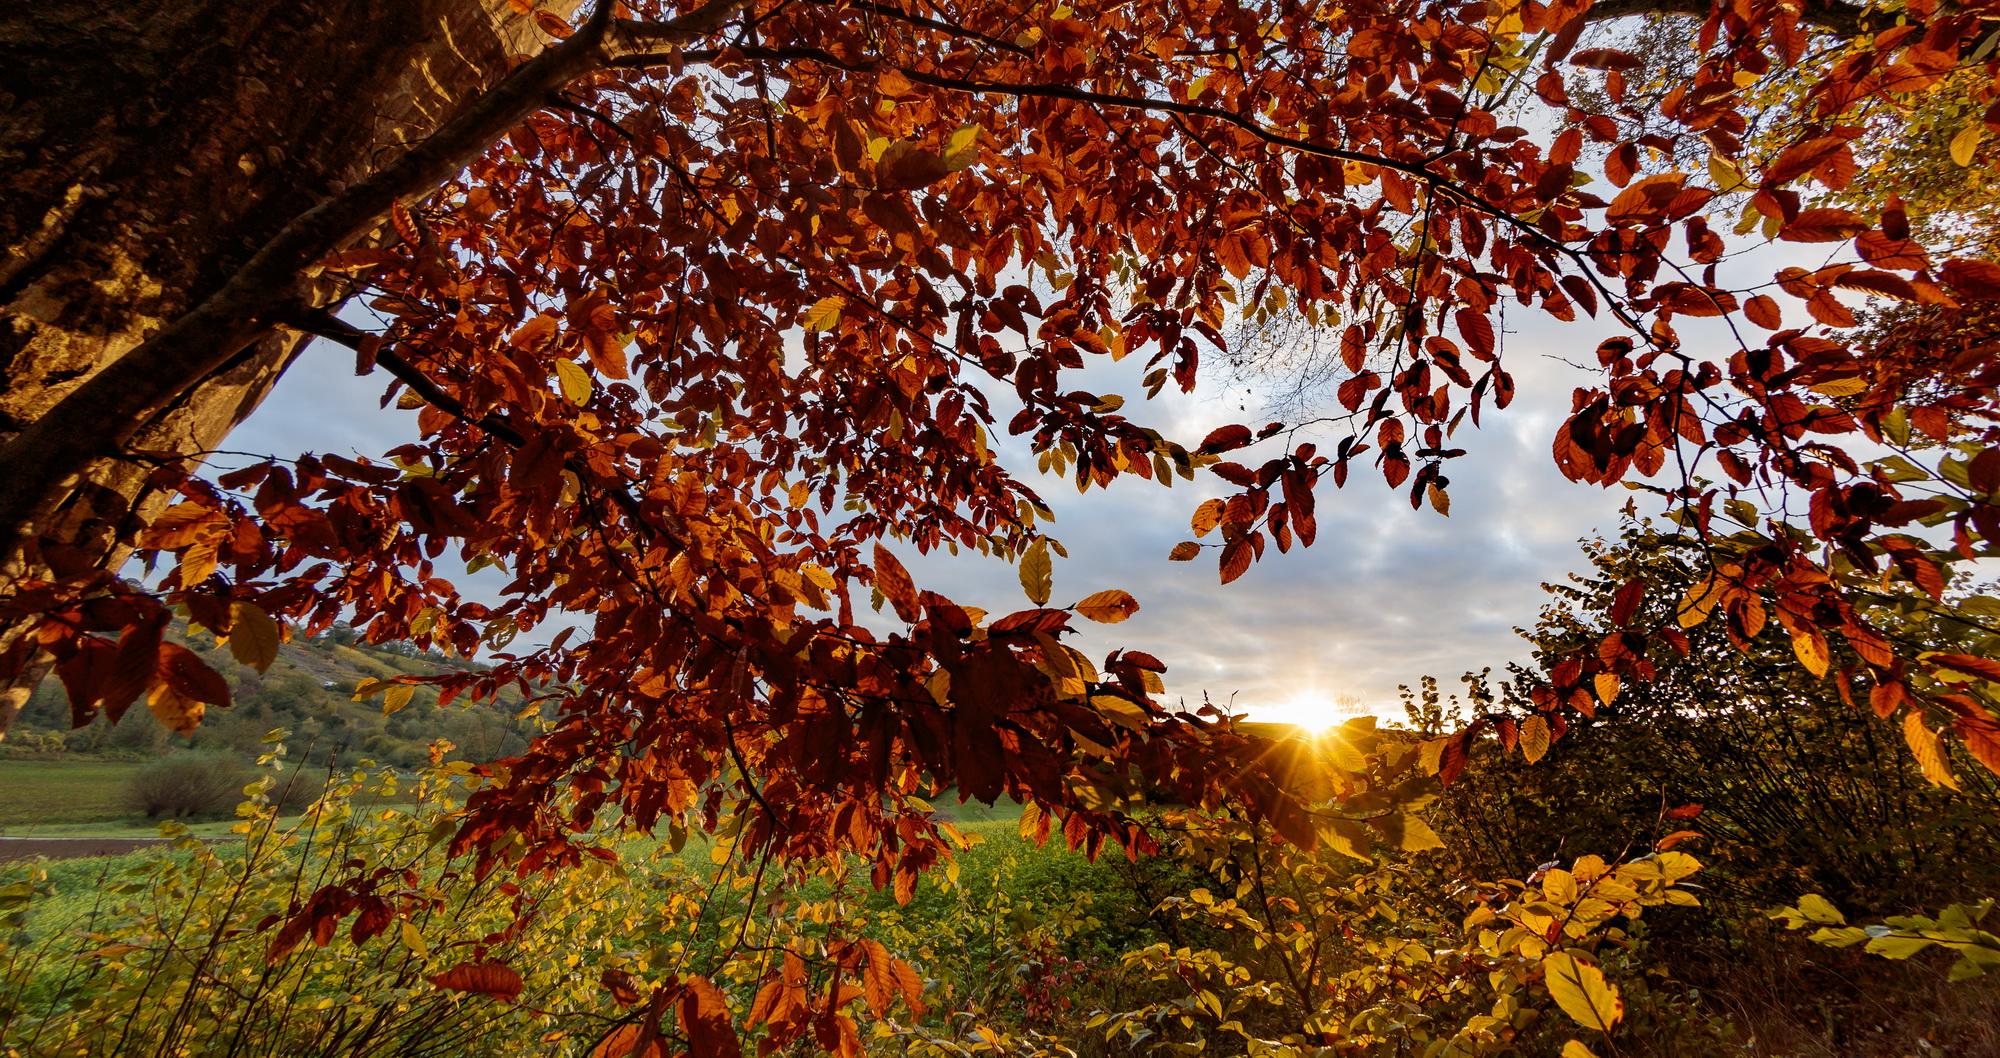 Herbstlaub, Herbstwald